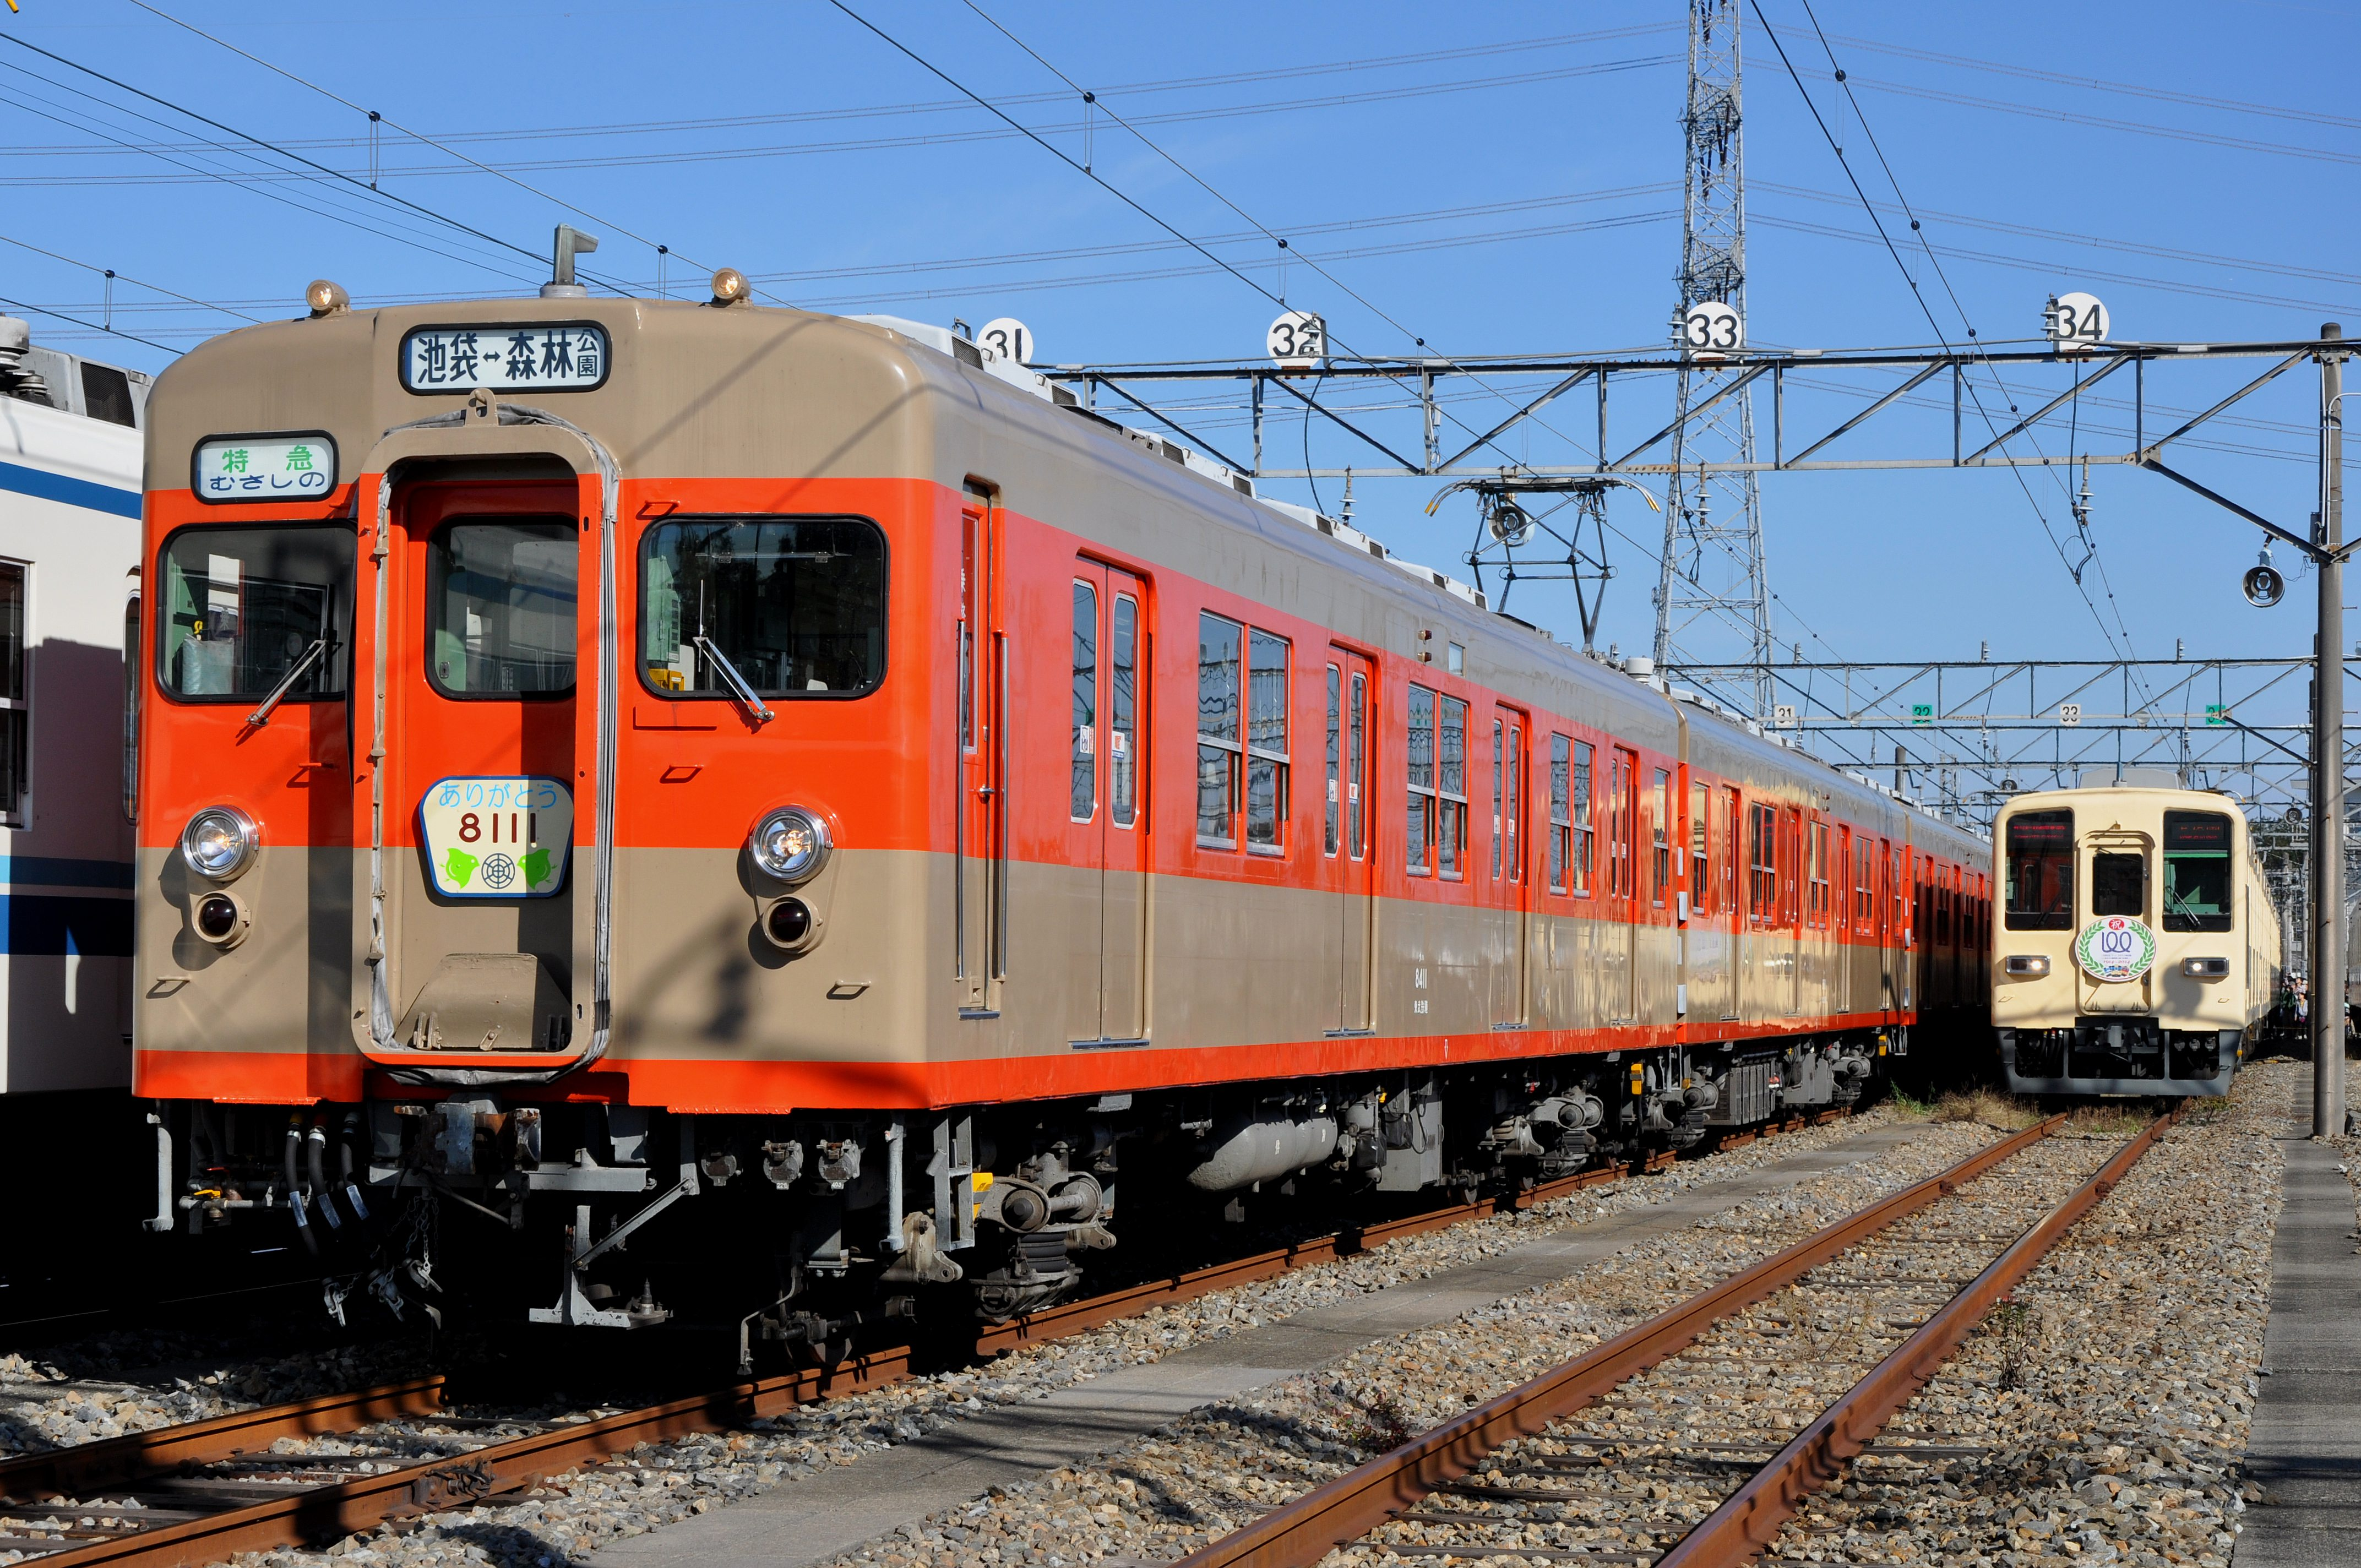 DSC_0865001.jpg